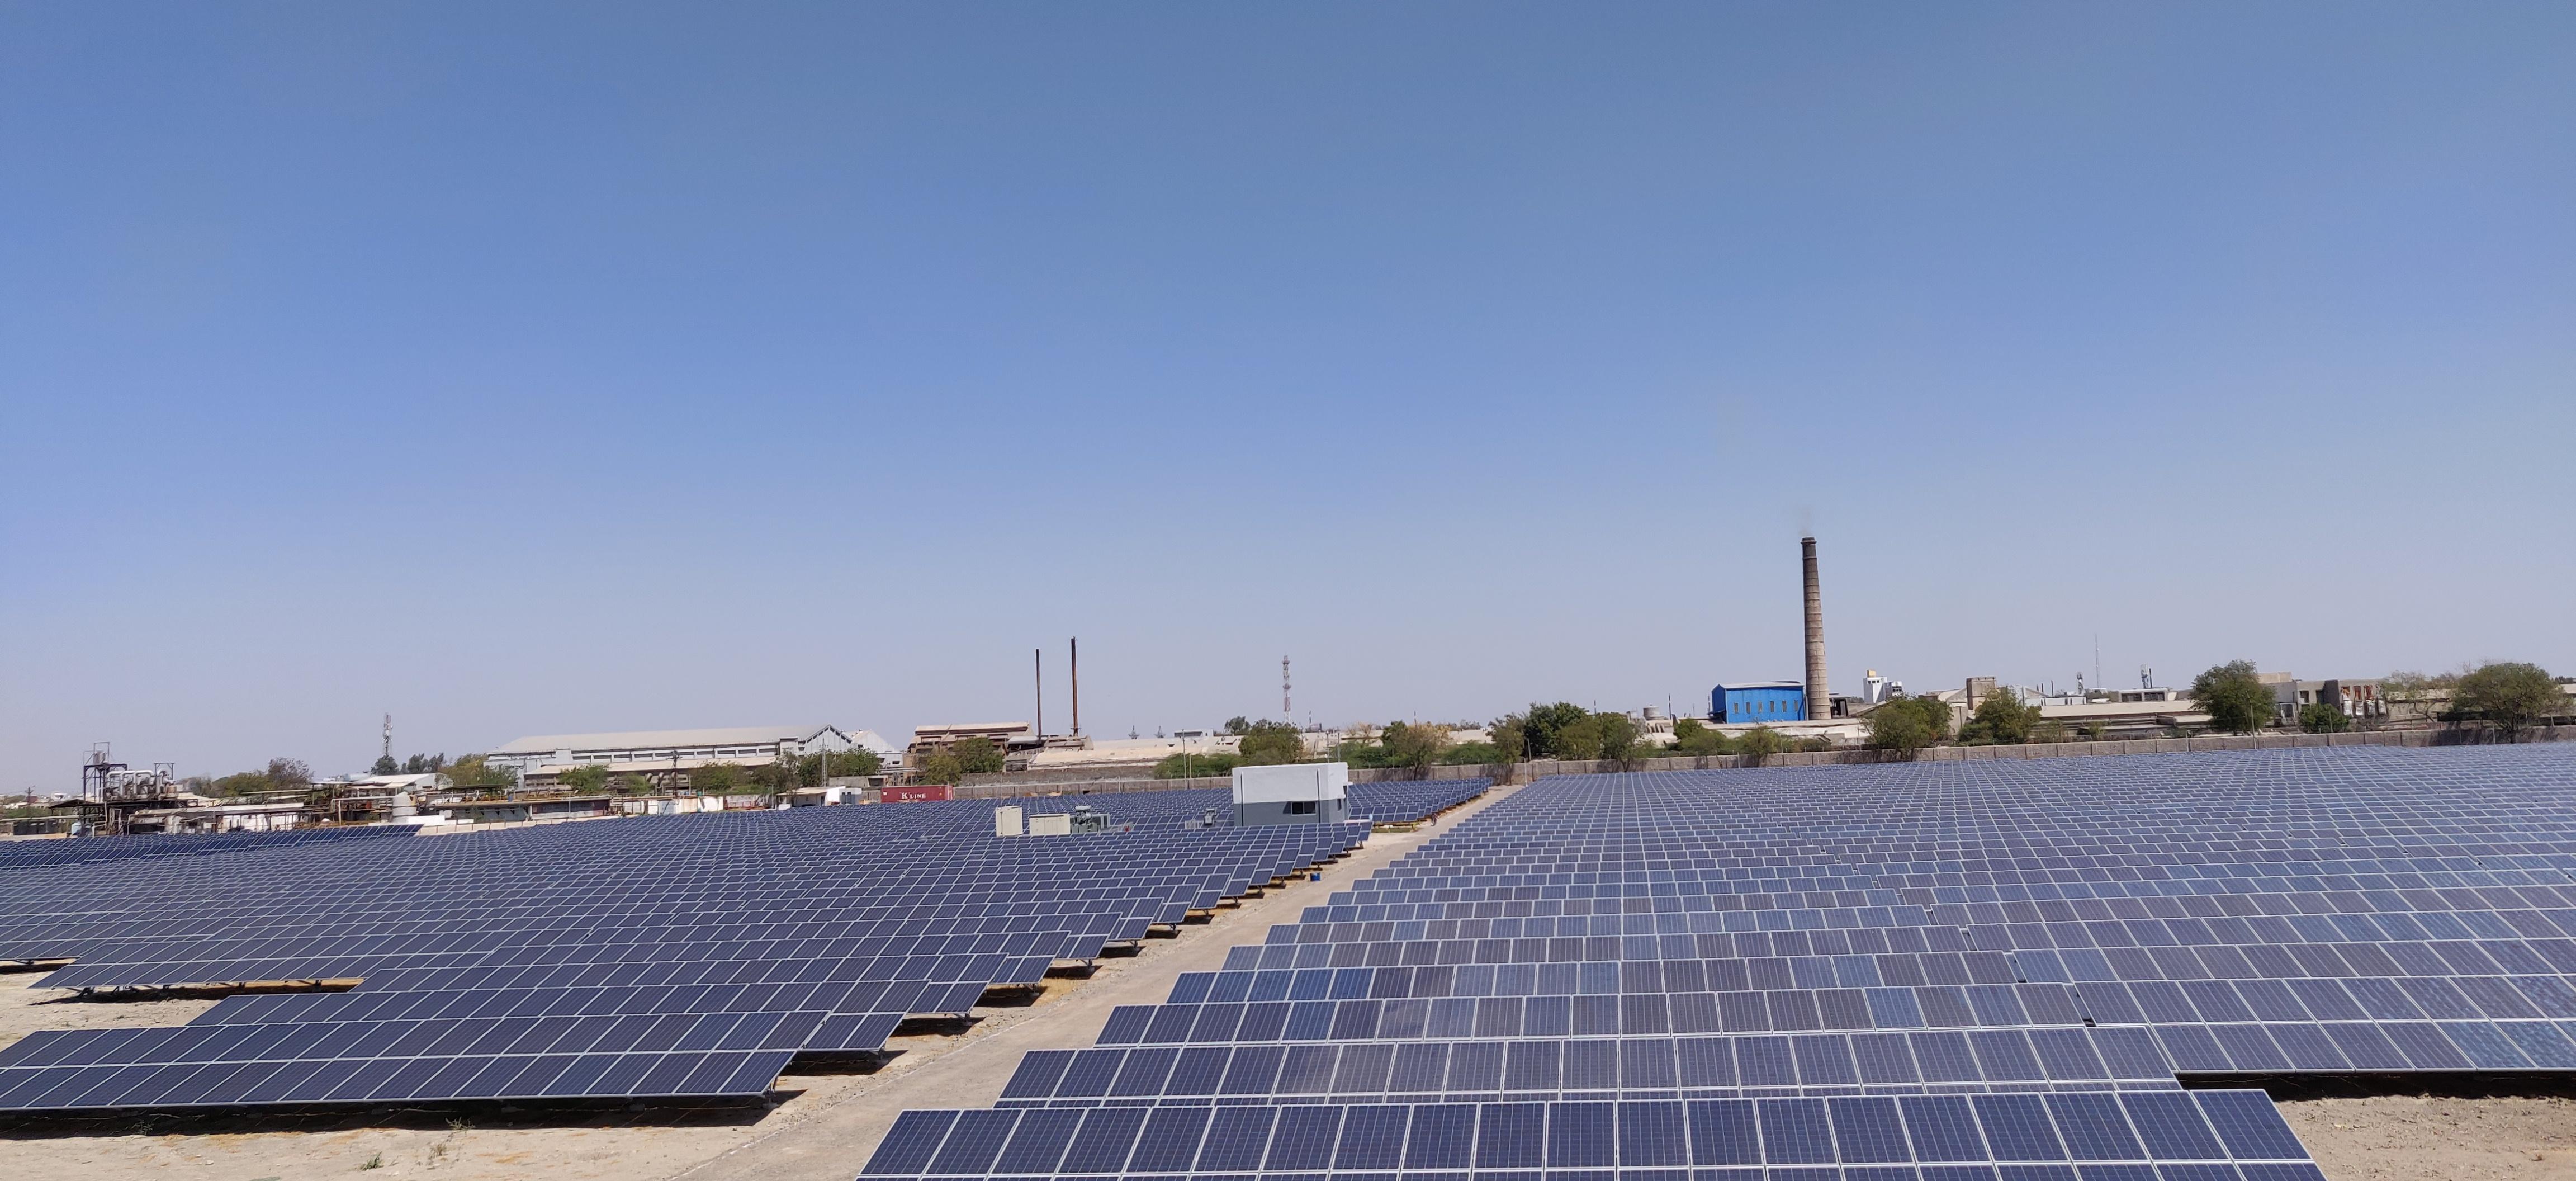 RenewSys Solar Panels, Pali, India